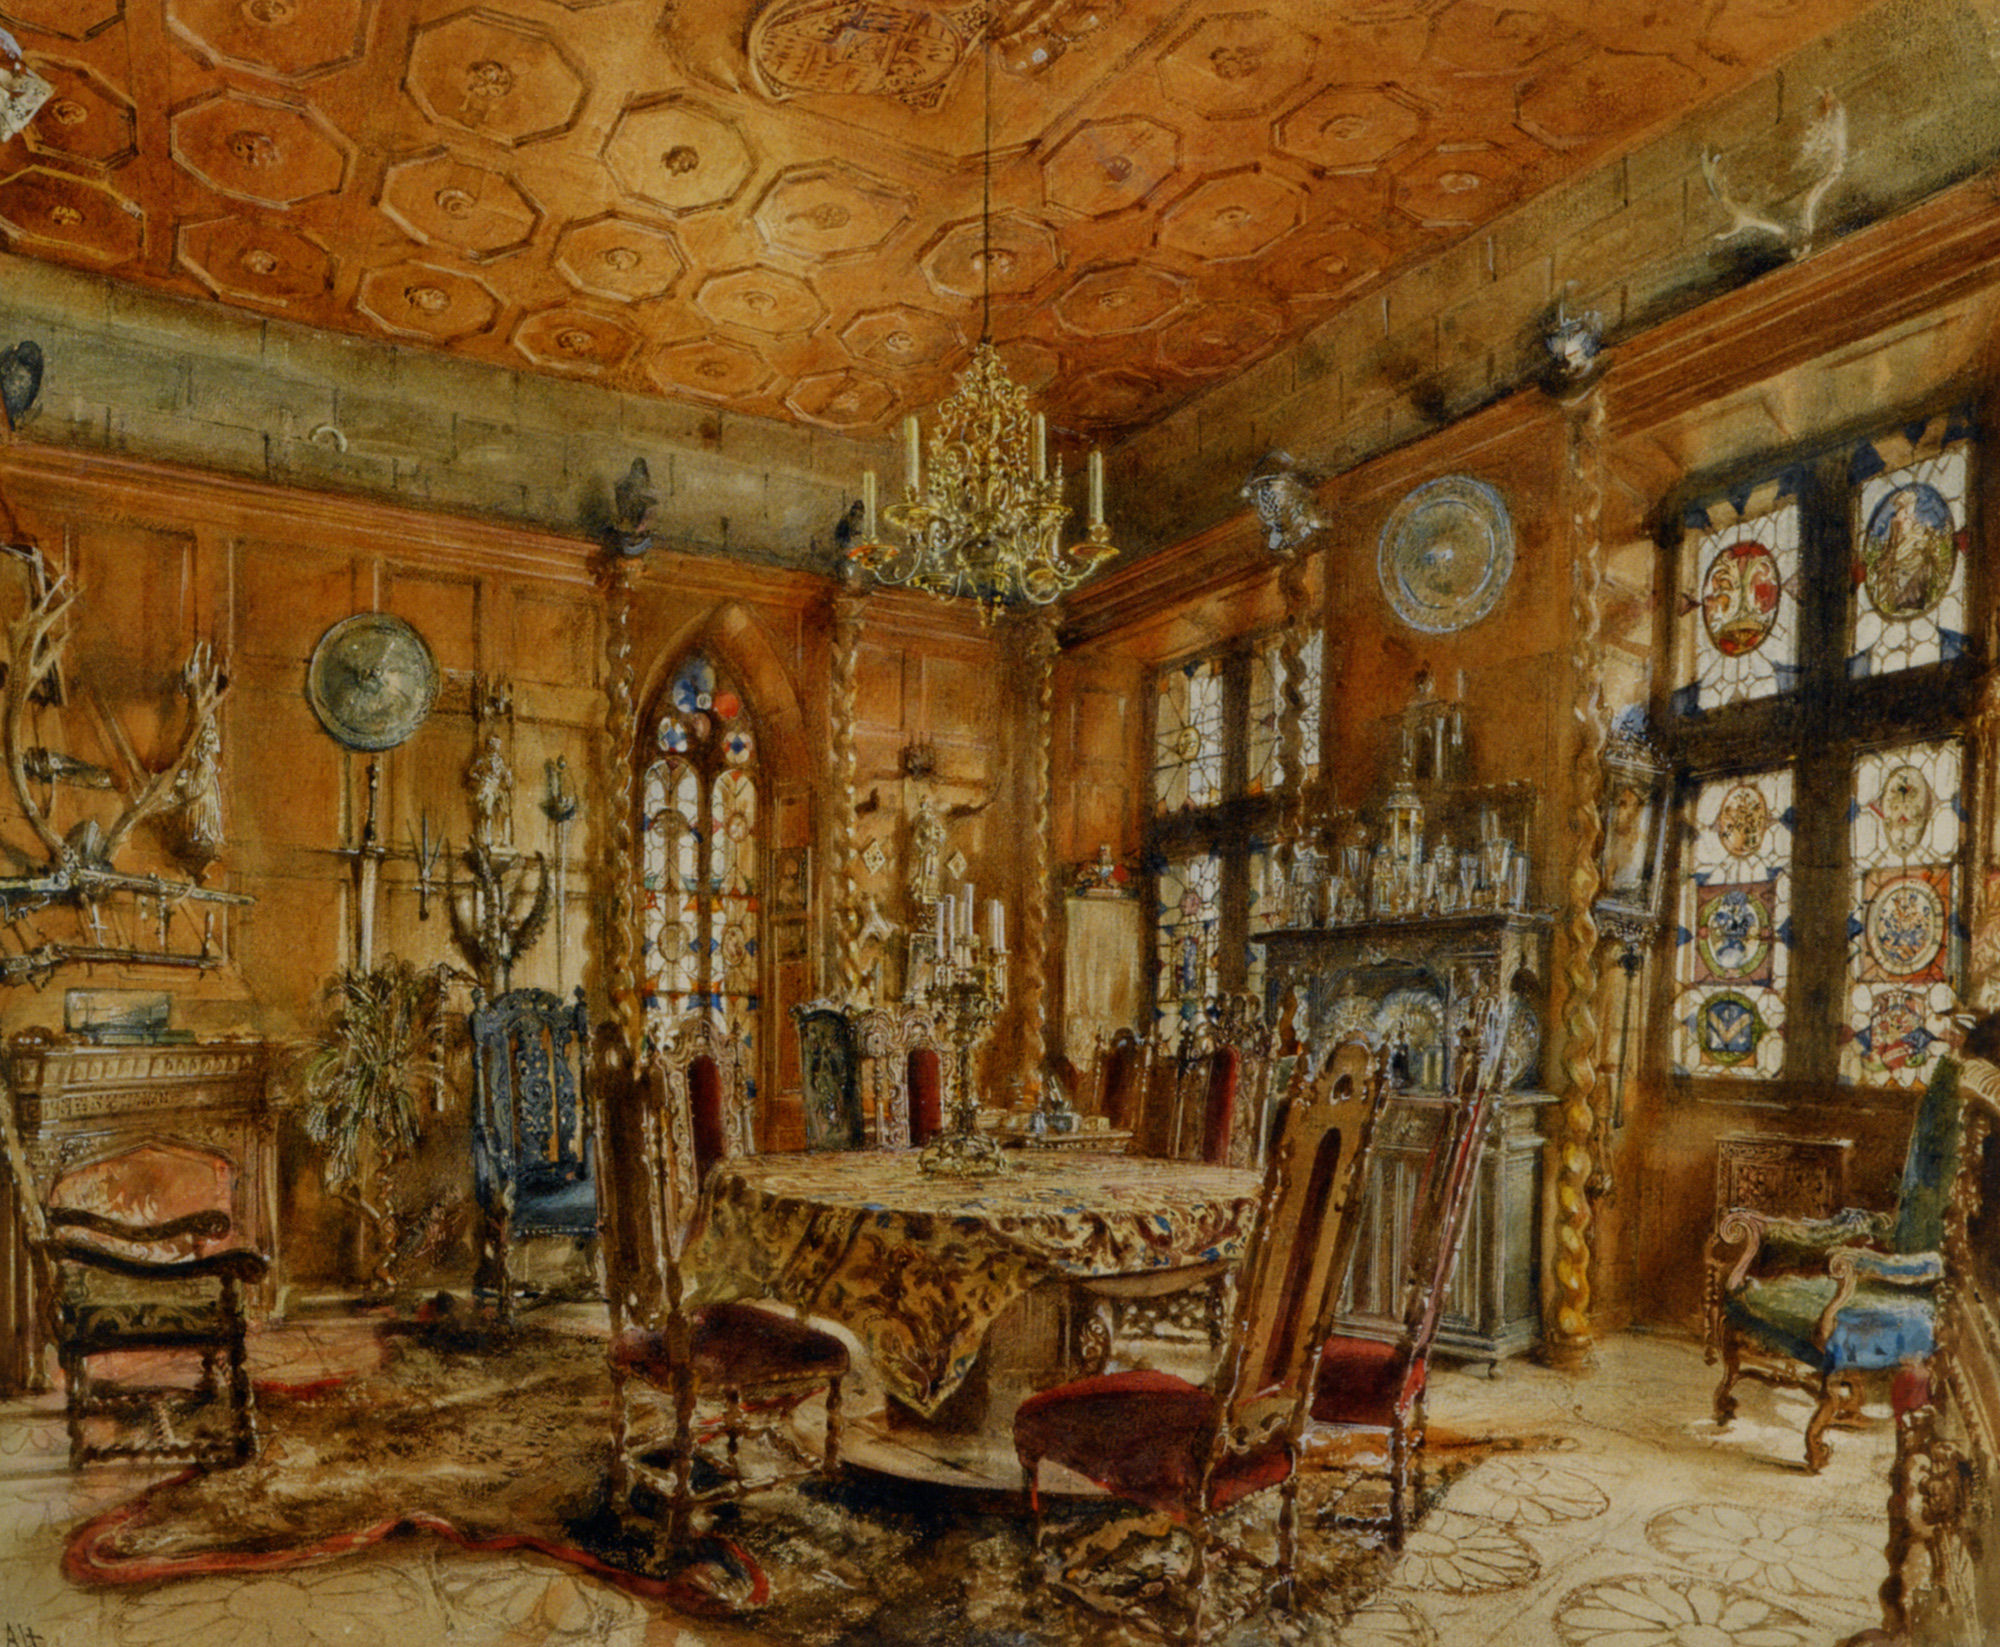 Palace interior in the Renaissance style  :: Rudolf Ritter von Alt - Rich interiors ôîòî